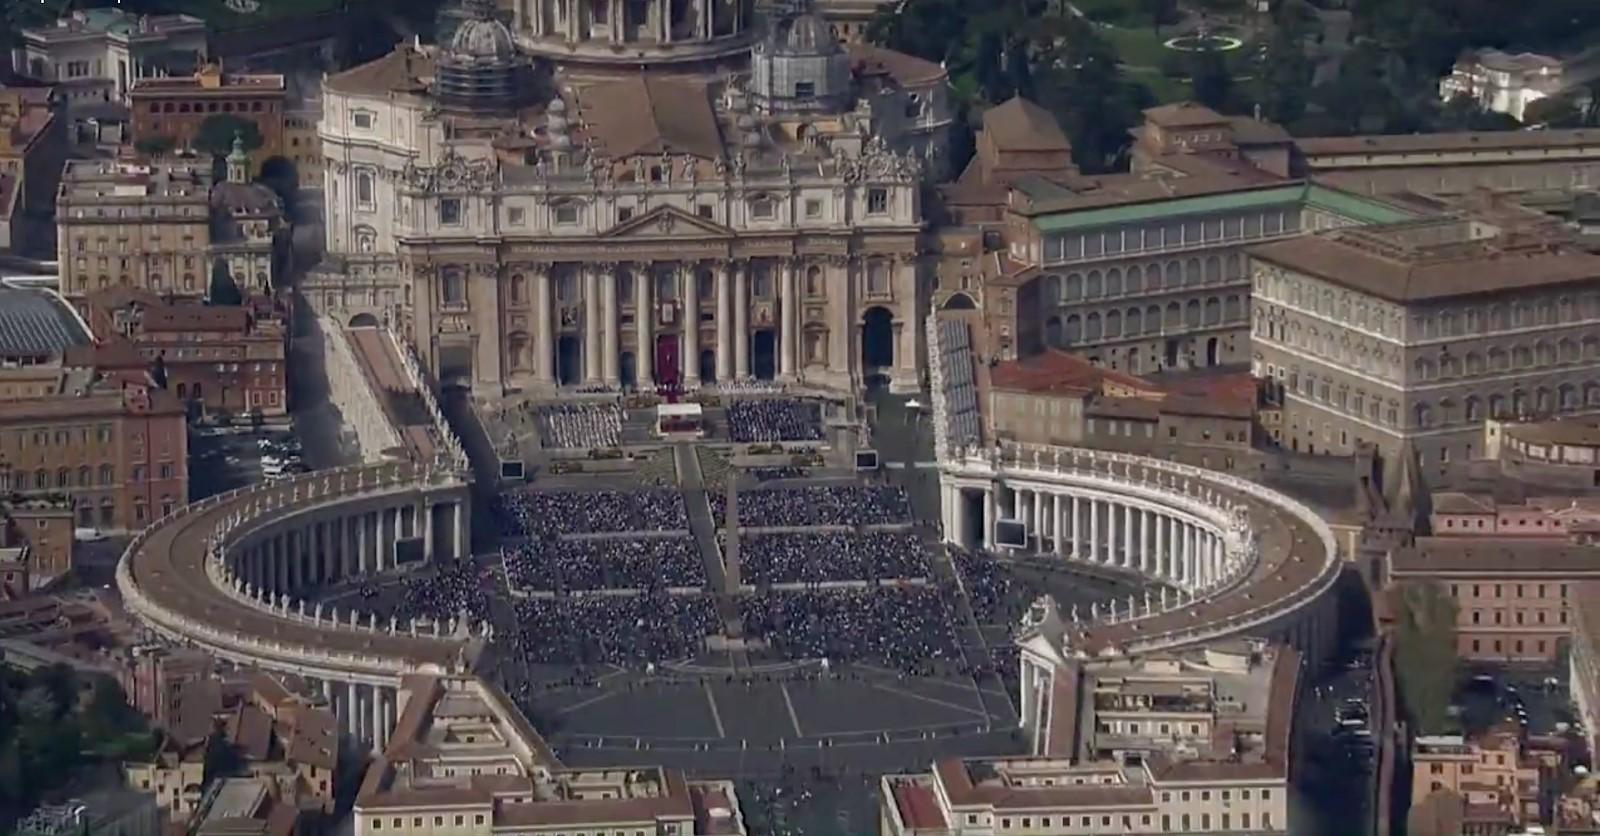 [Хабра-оффтоп] Maratona di Roma, или первый марафон для ИТ-шника - 5